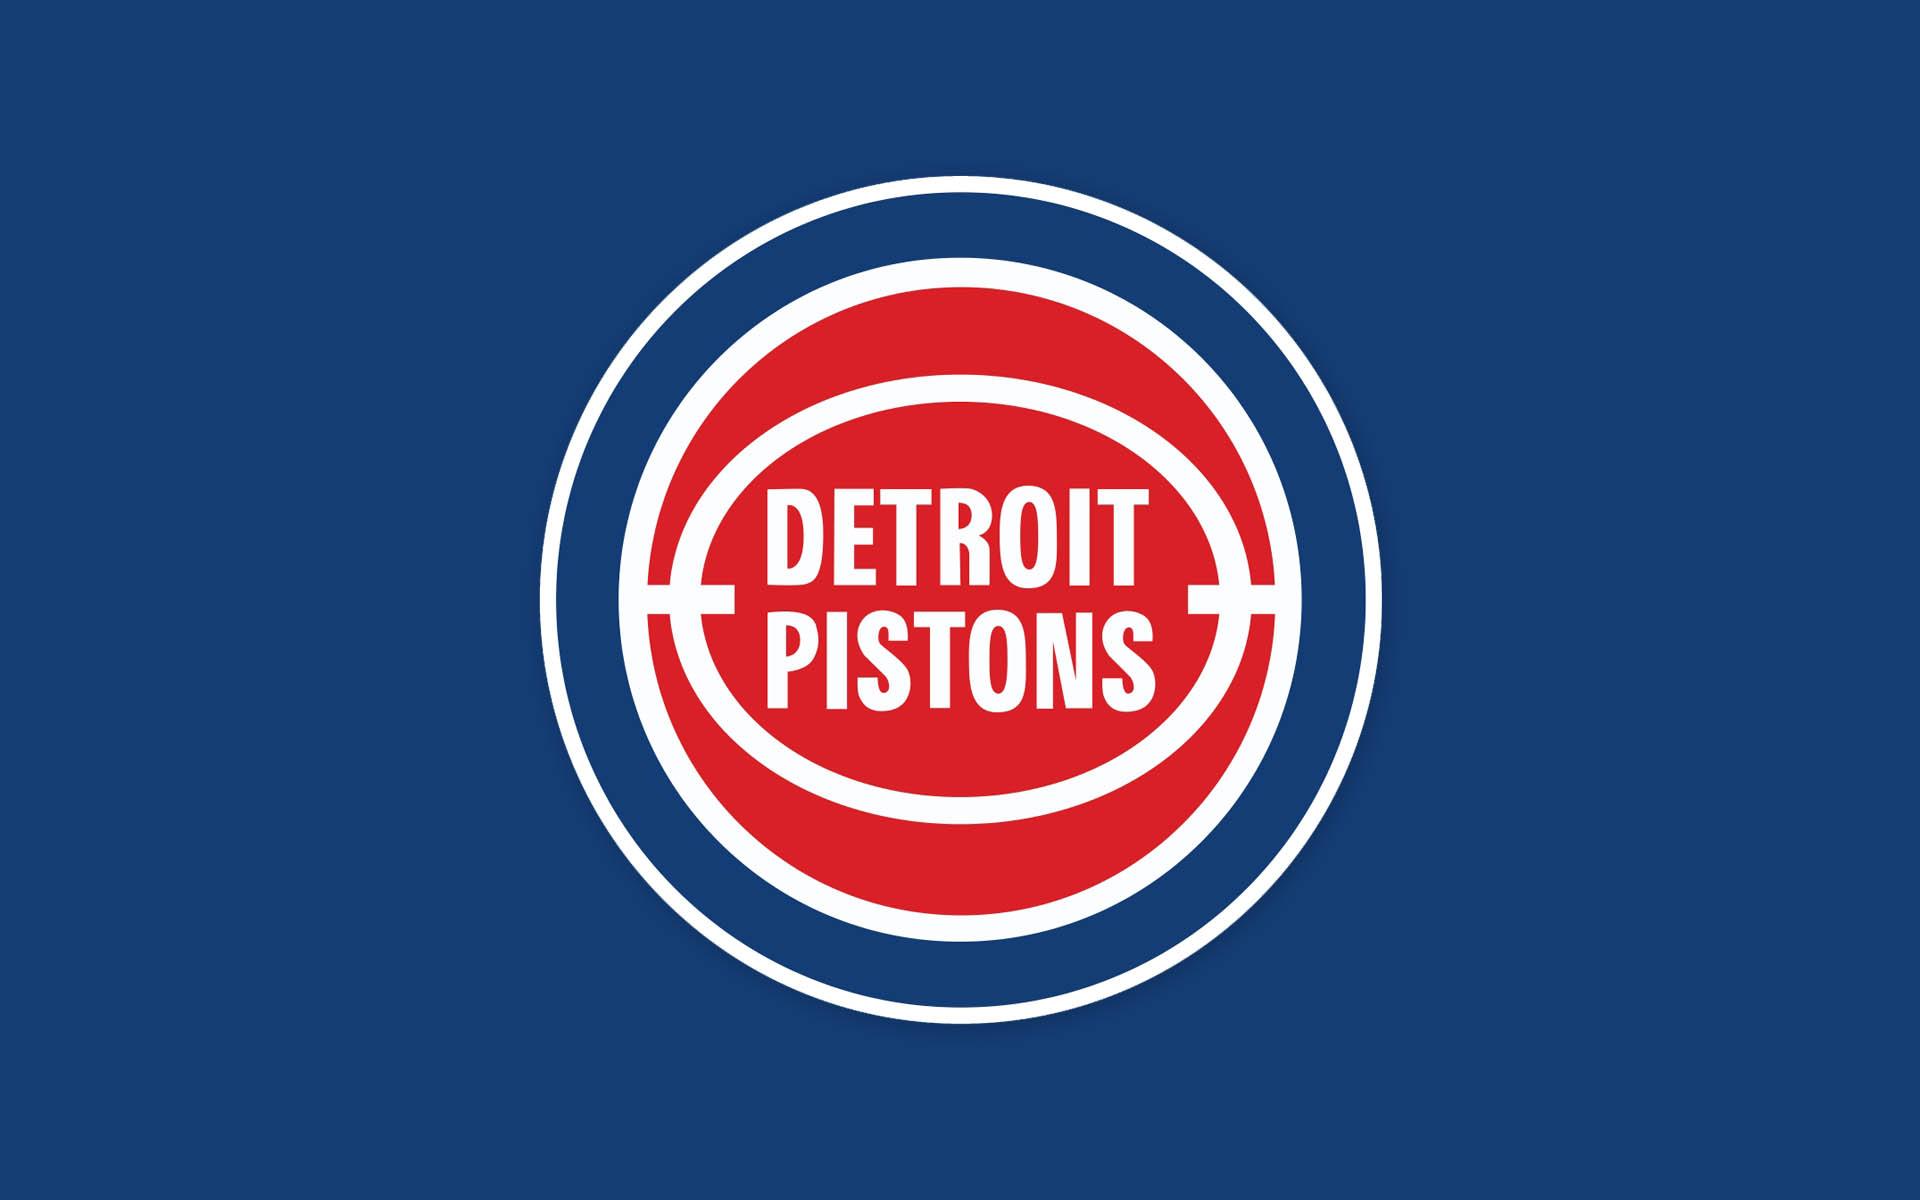 Detroit Pistons Wallpaper for Computer - WallpaperSafari